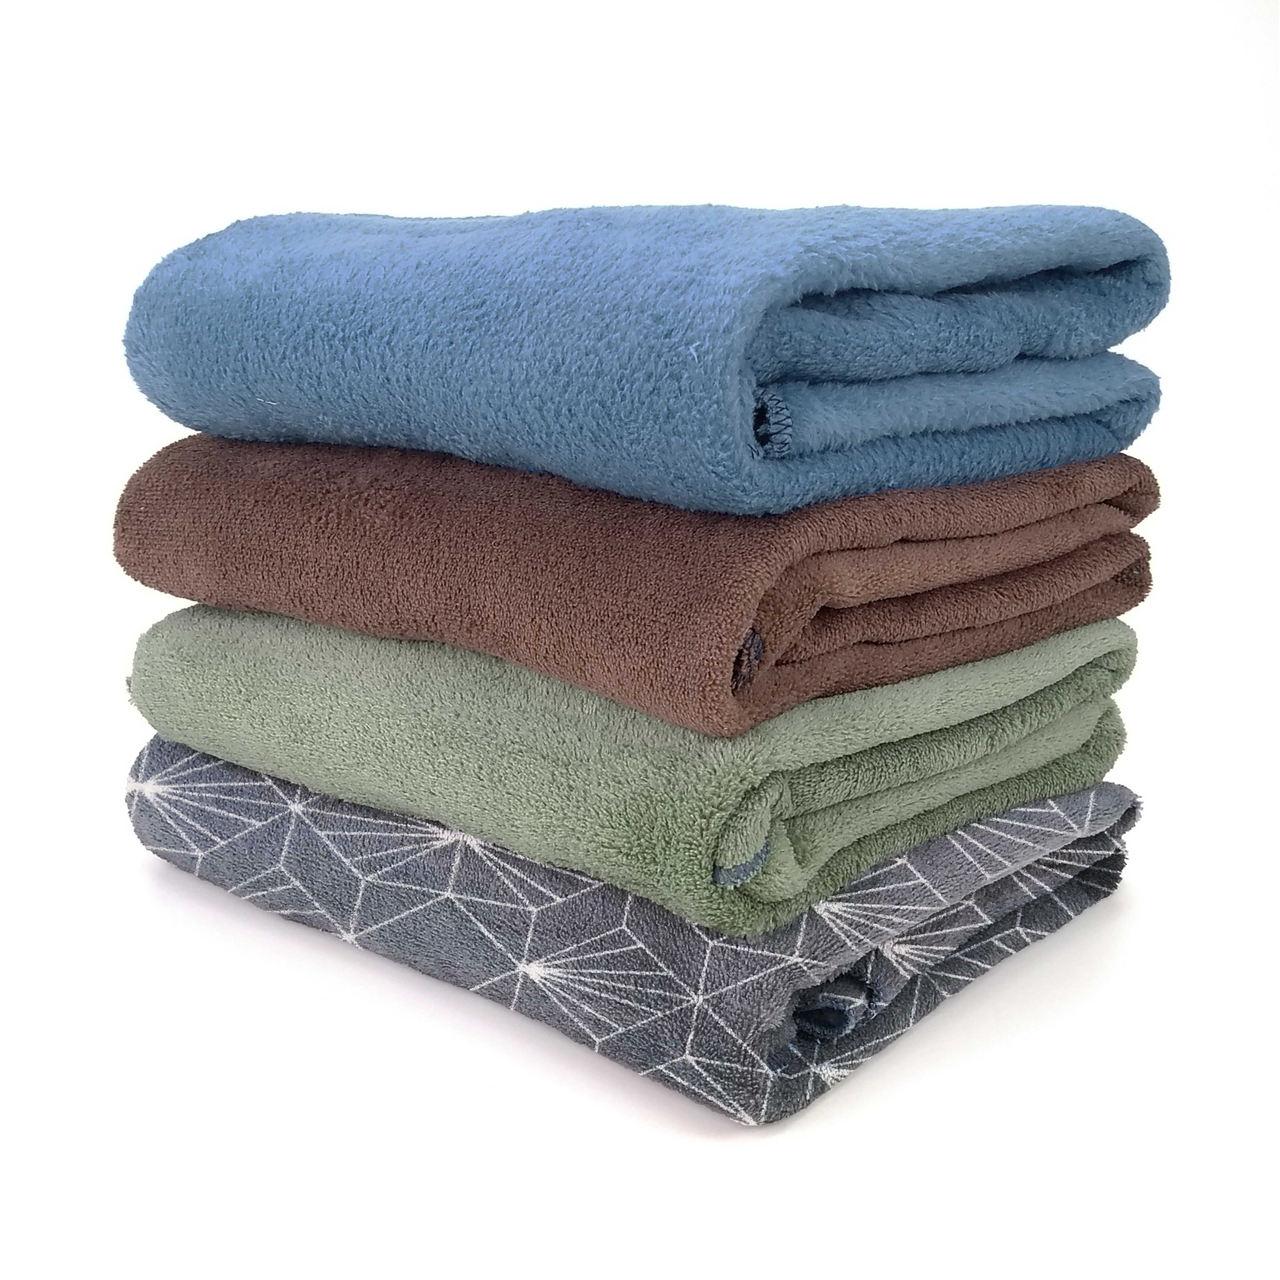 Kit 4 Cobertor Manta Pet Fleece Gato Cachorro 1,10 x 0,90m - Berve Enxovais